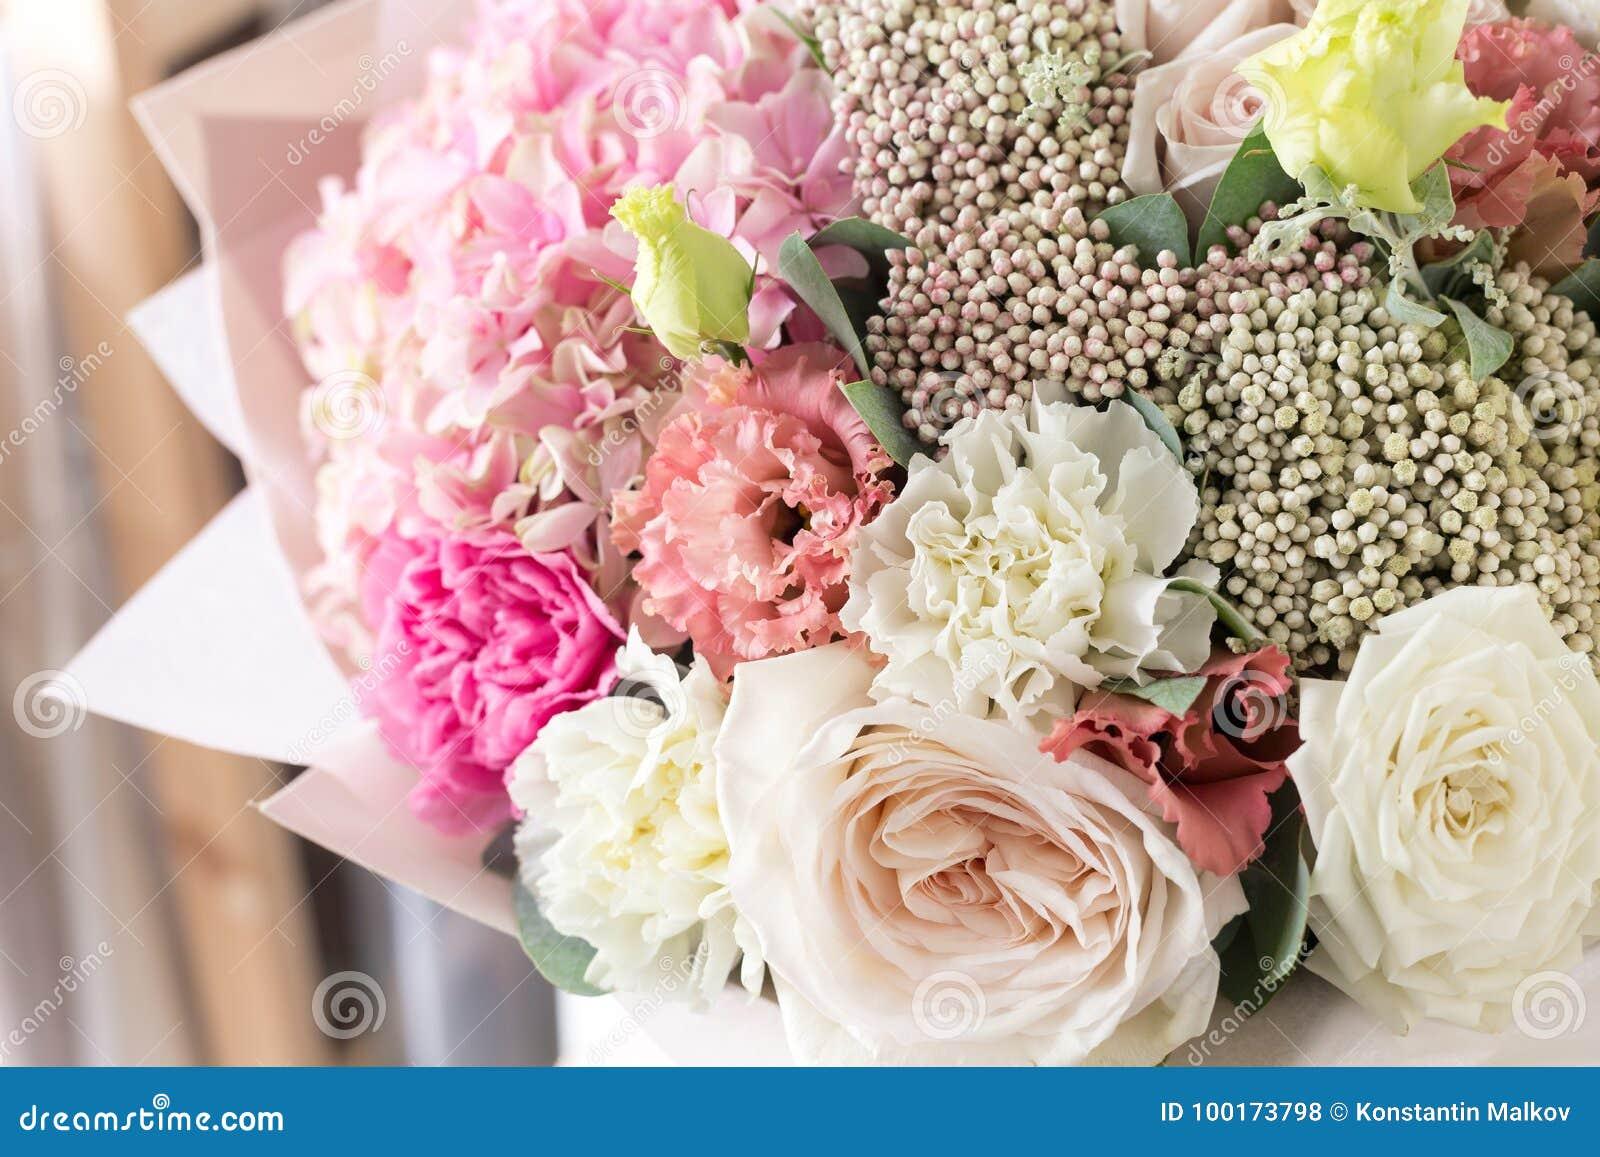 Bouquet in foamiran paper a simple bouquet of flowers and greens download bouquet in foamiran paper a simple bouquet of flowers and greens stock photo izmirmasajfo